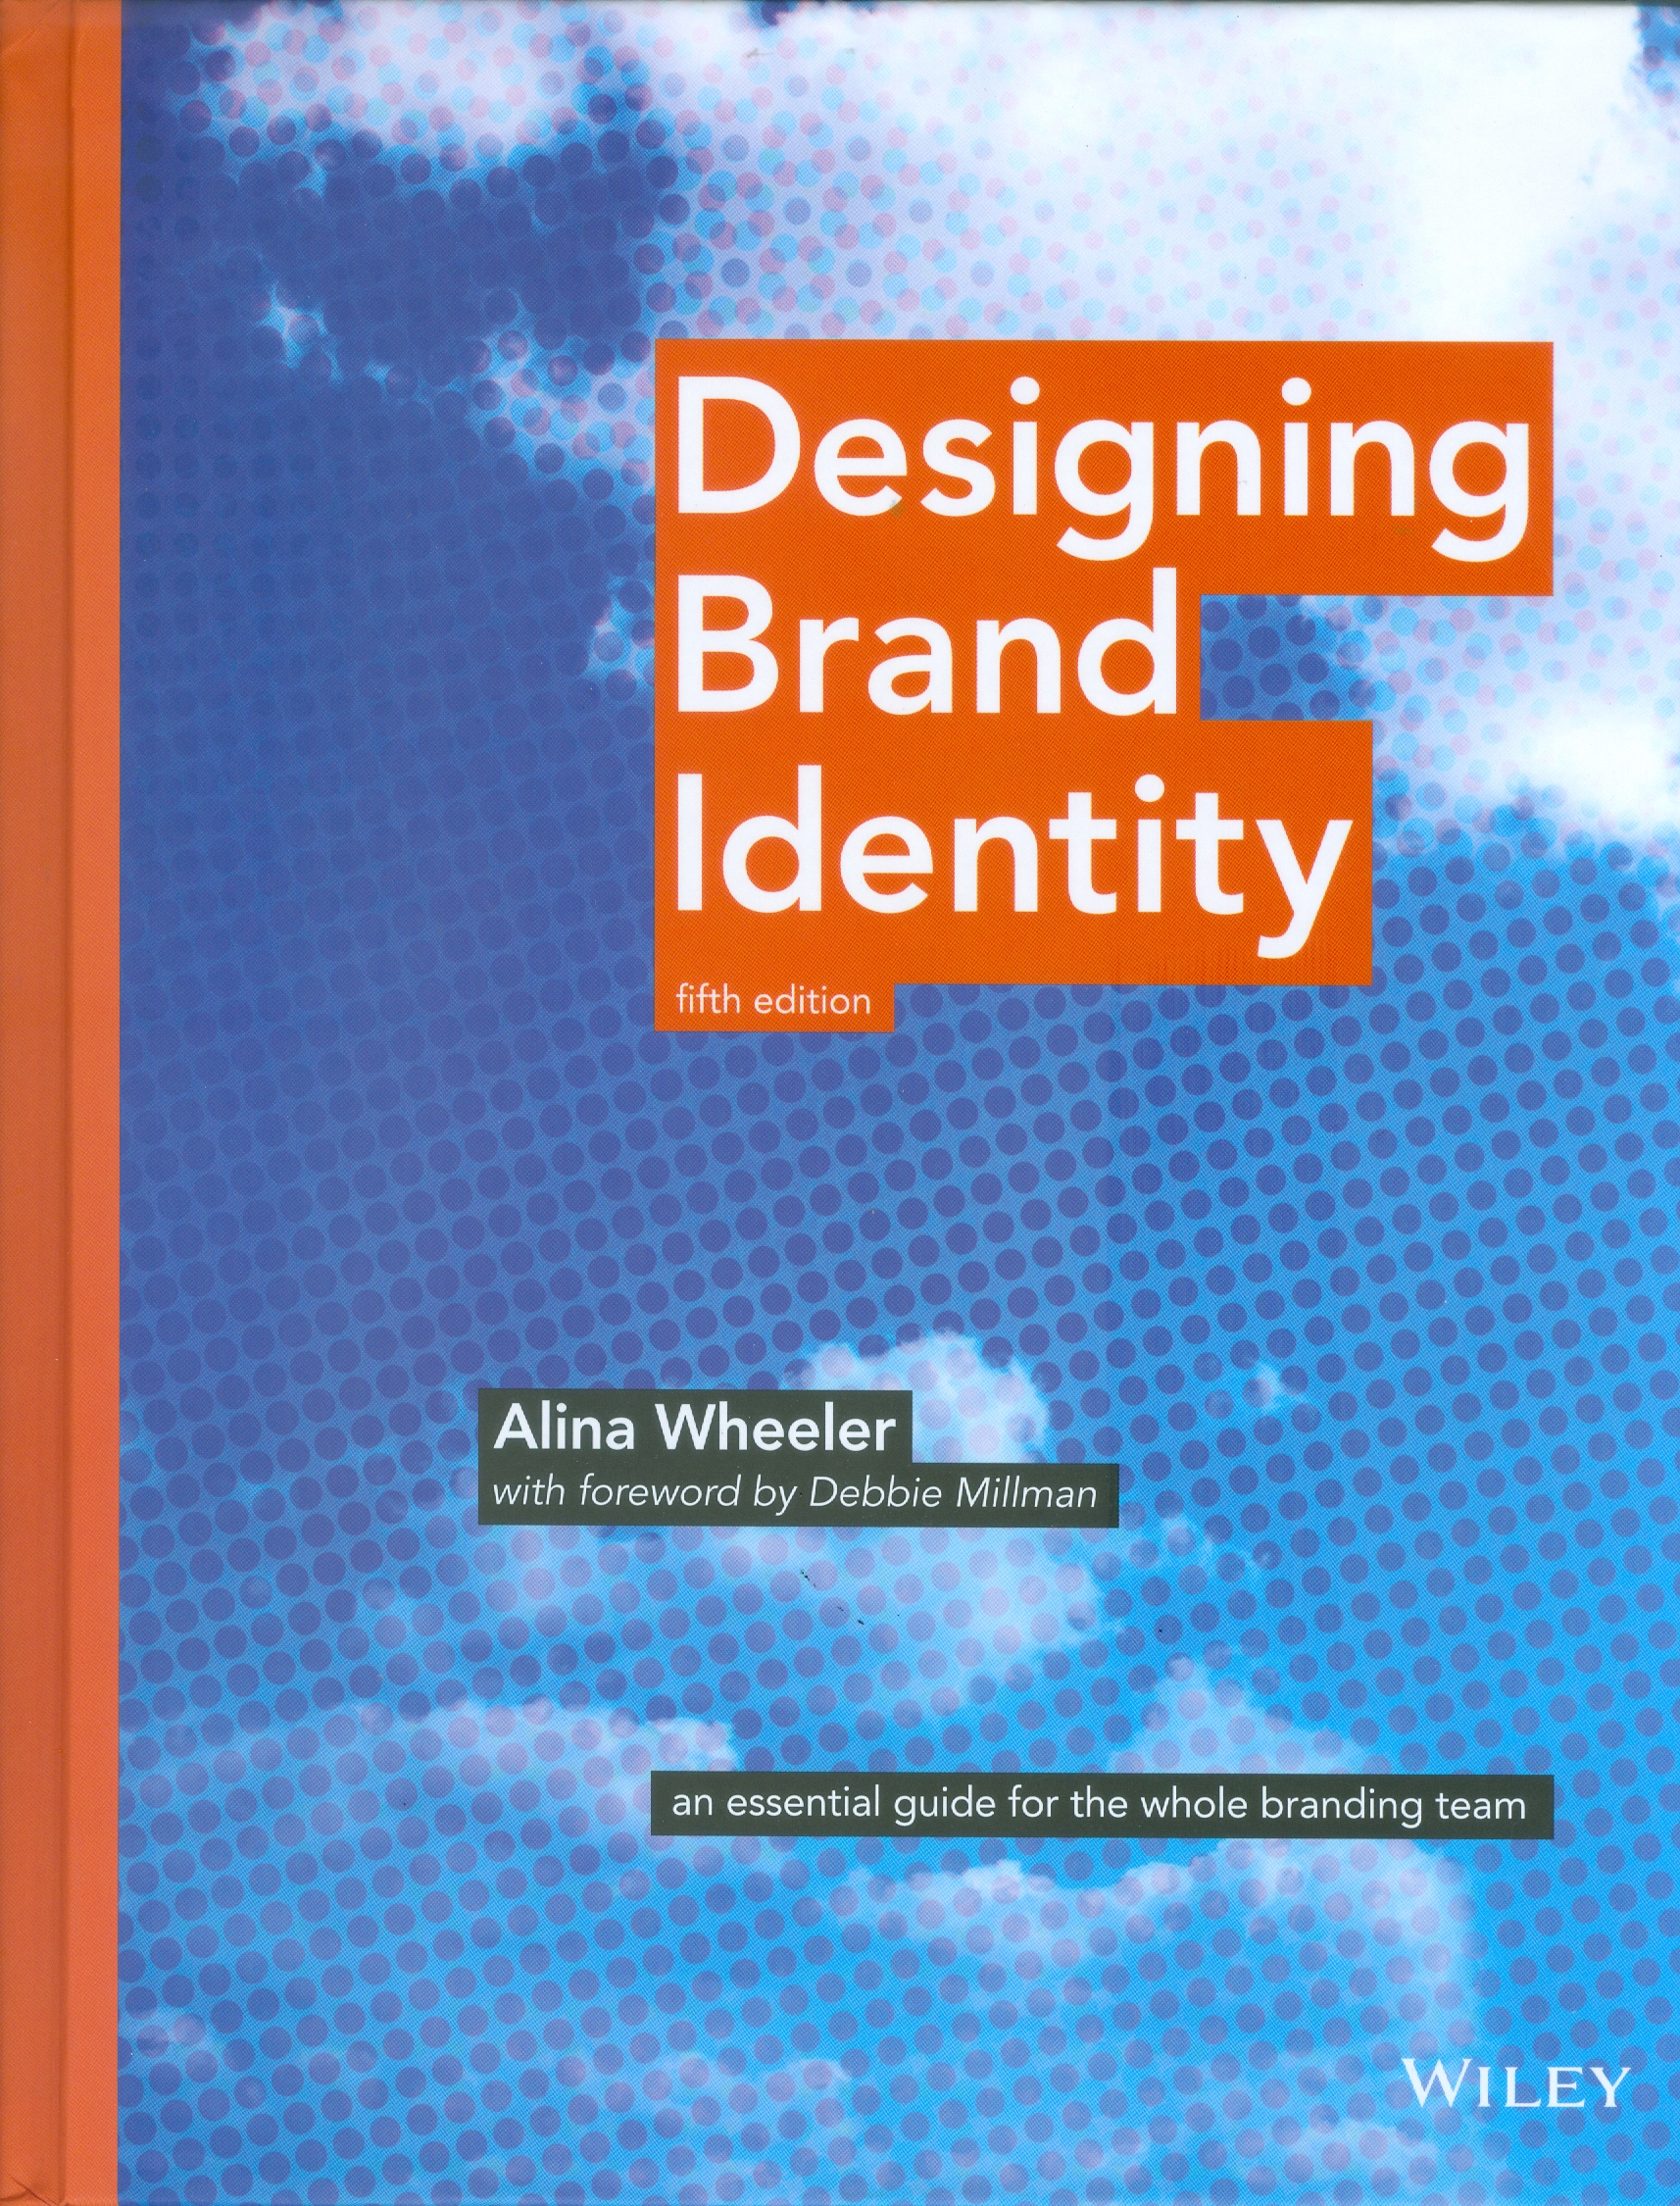 Designing Brand Identity0001.jpg